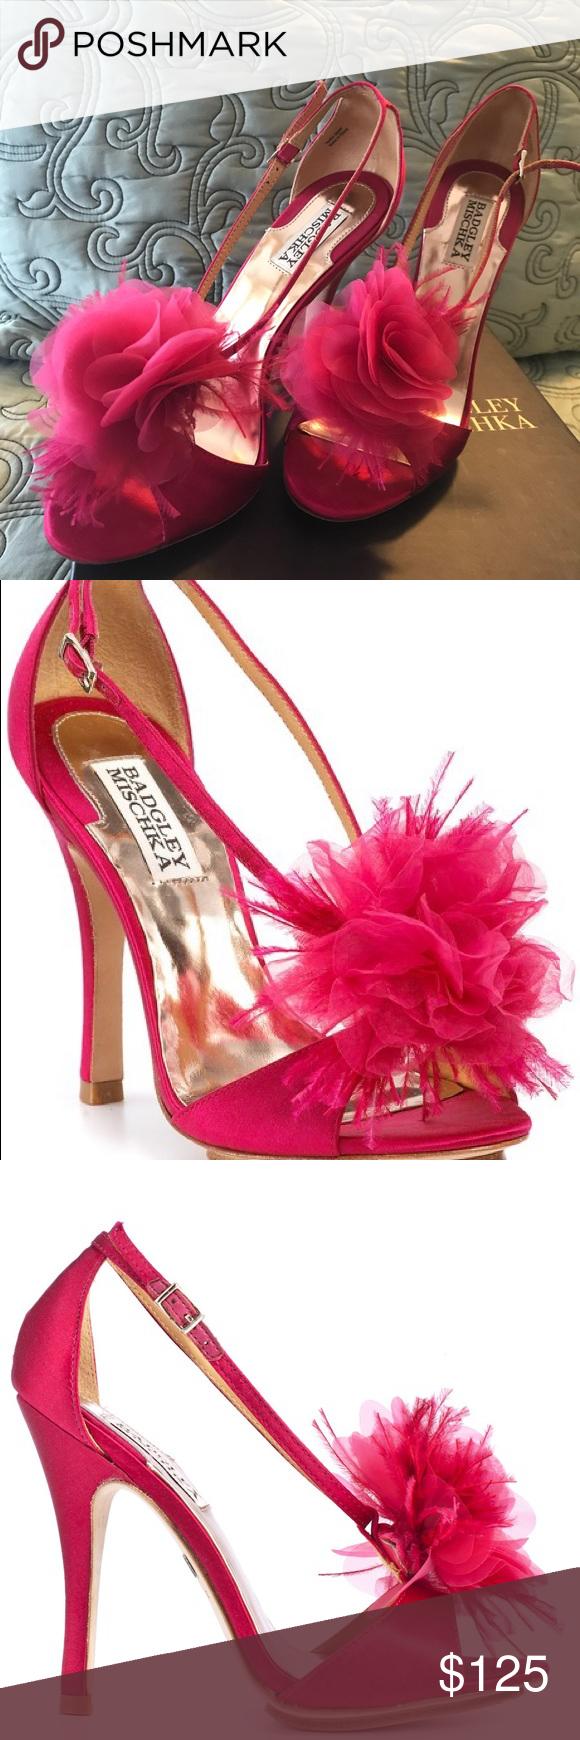 Badgley Mischka Kiwi Sandal Nwt My Posh Picks Pinterest